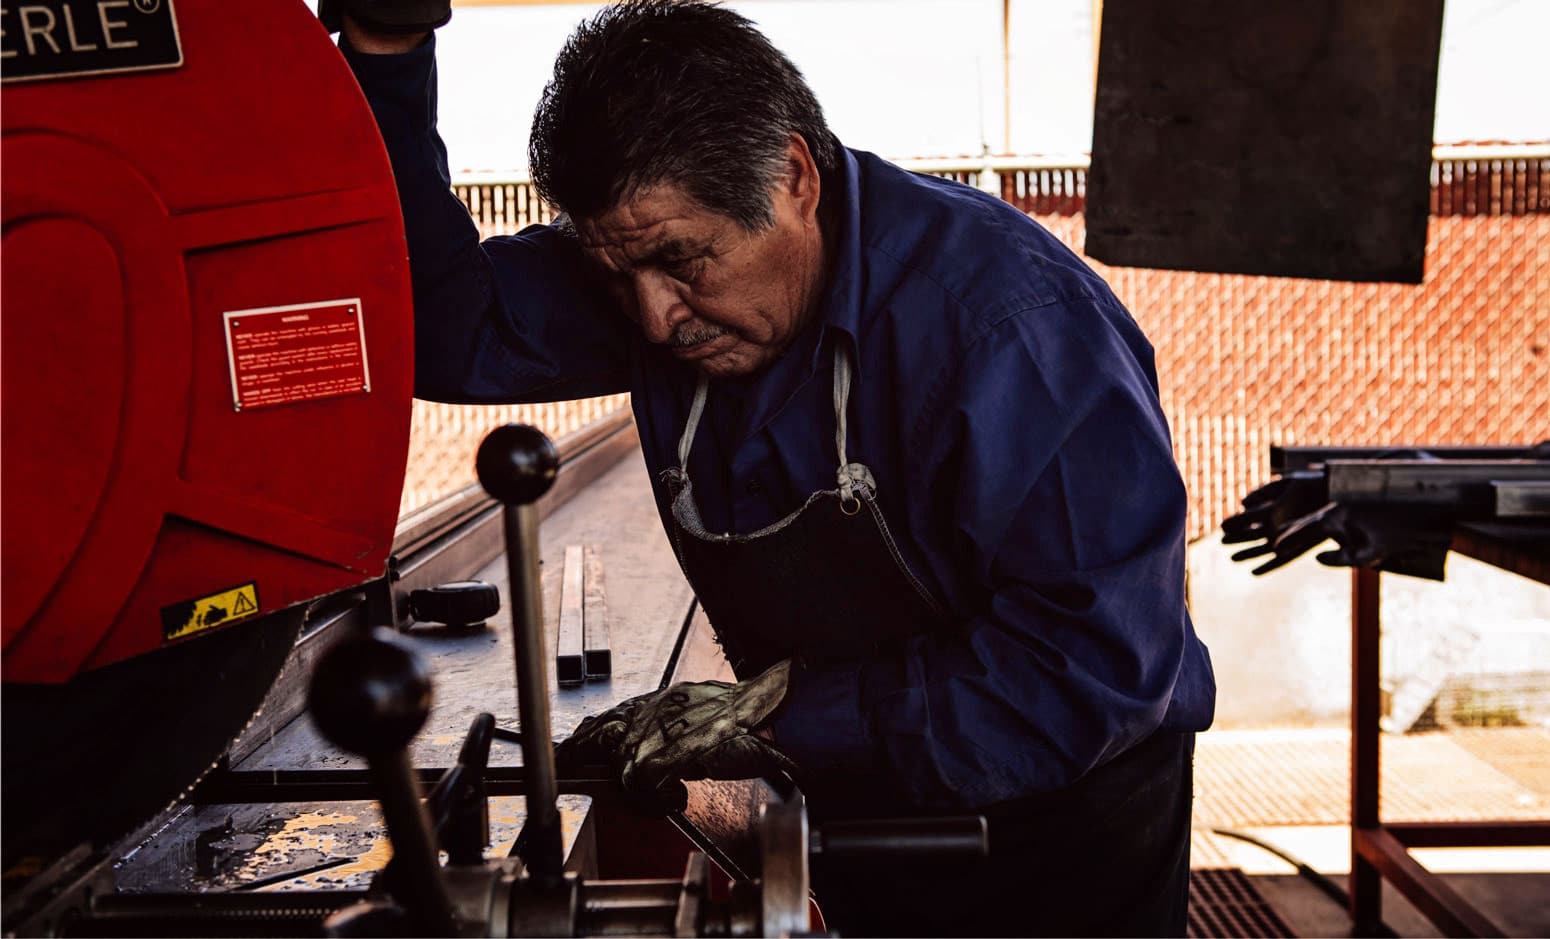 modern metal door cutting production process